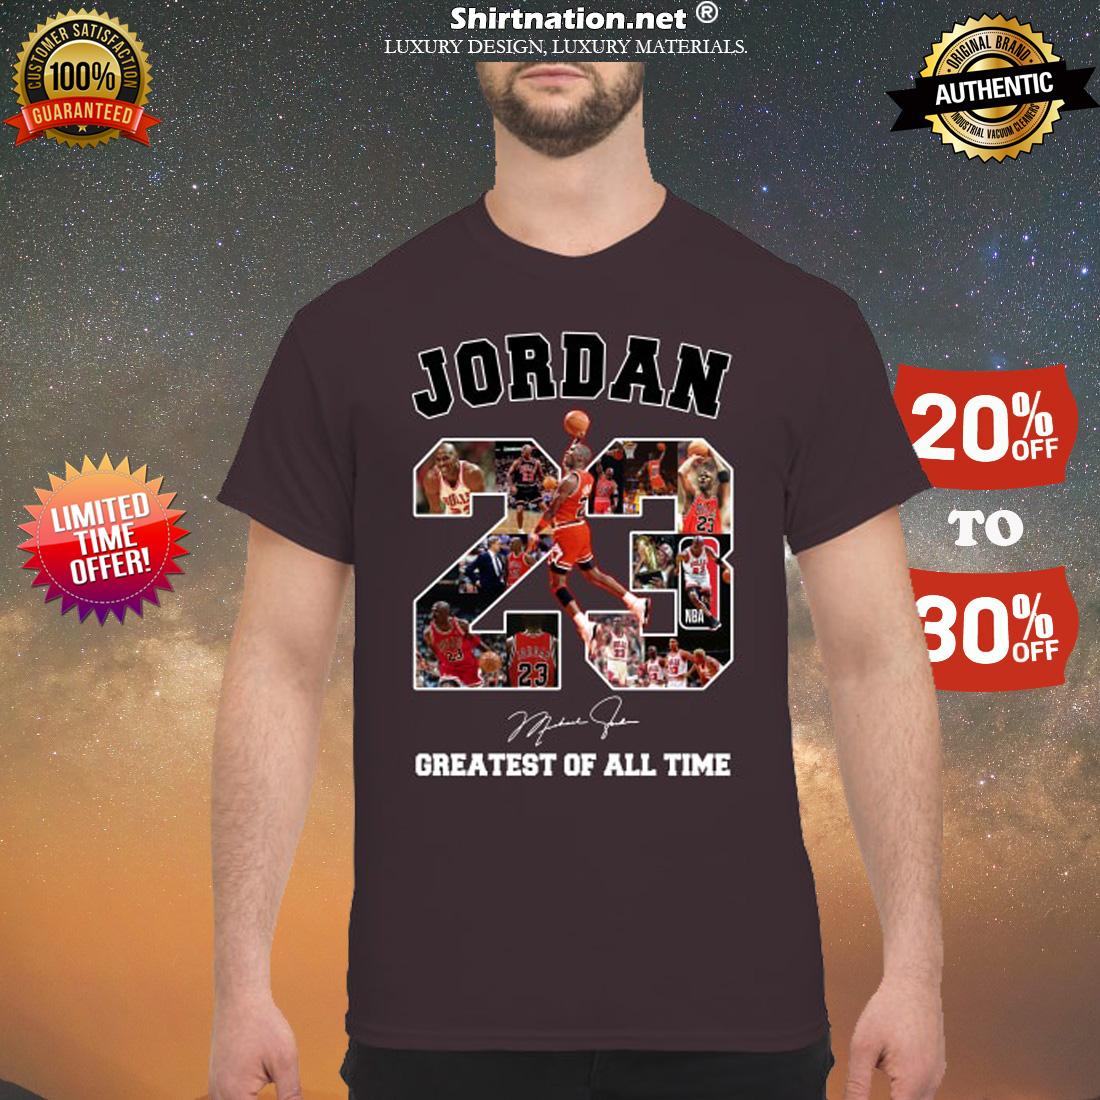 Micheal Jordan 23 greatest of all time shirt